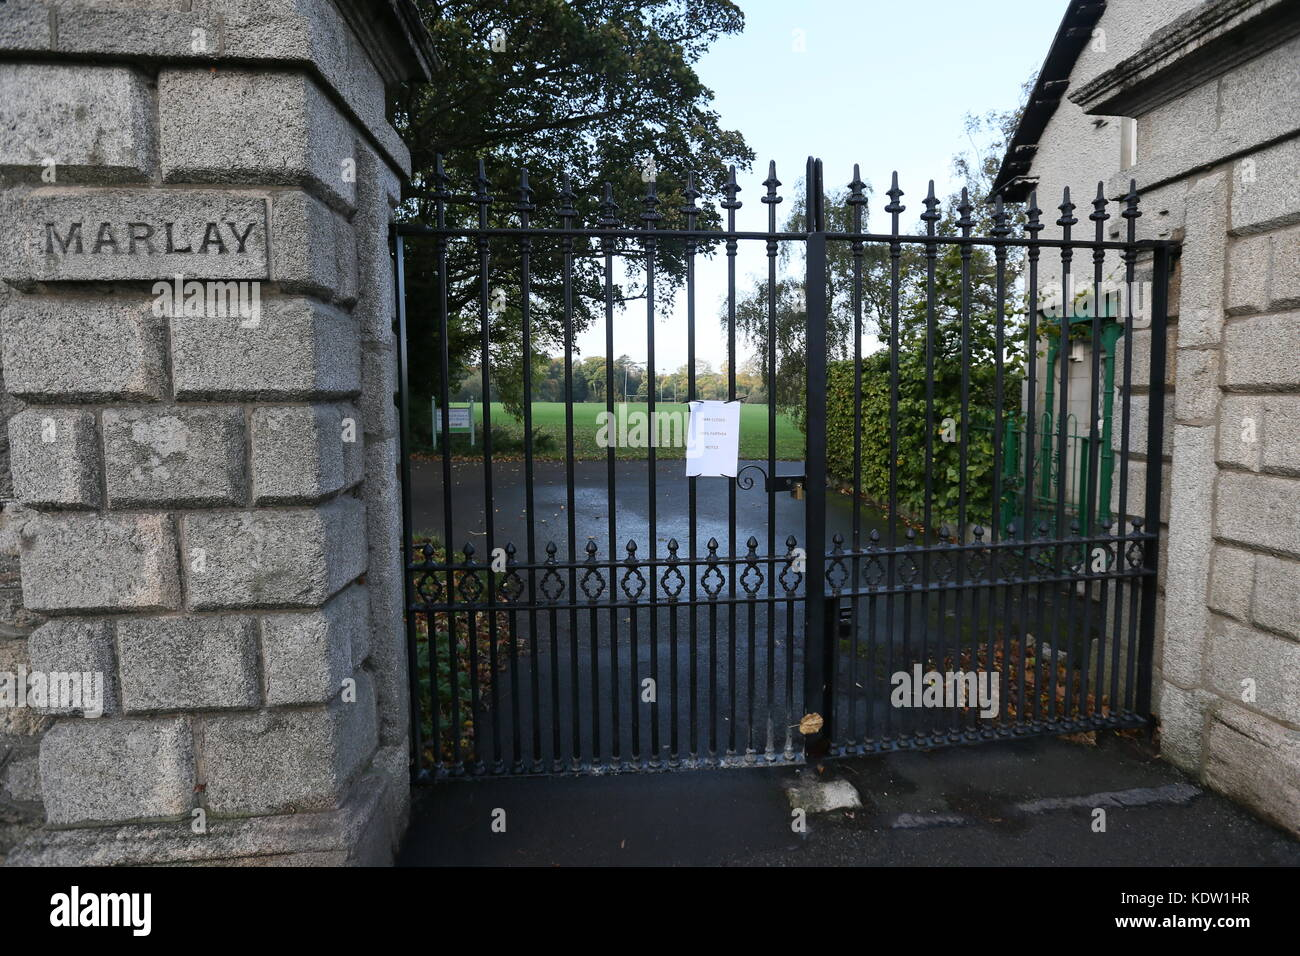 Dublin, Ireland. 16th Oct, 2017. The shut gates of Dublin's Marlay Park in South Dublin. The park closed during - Stock Image